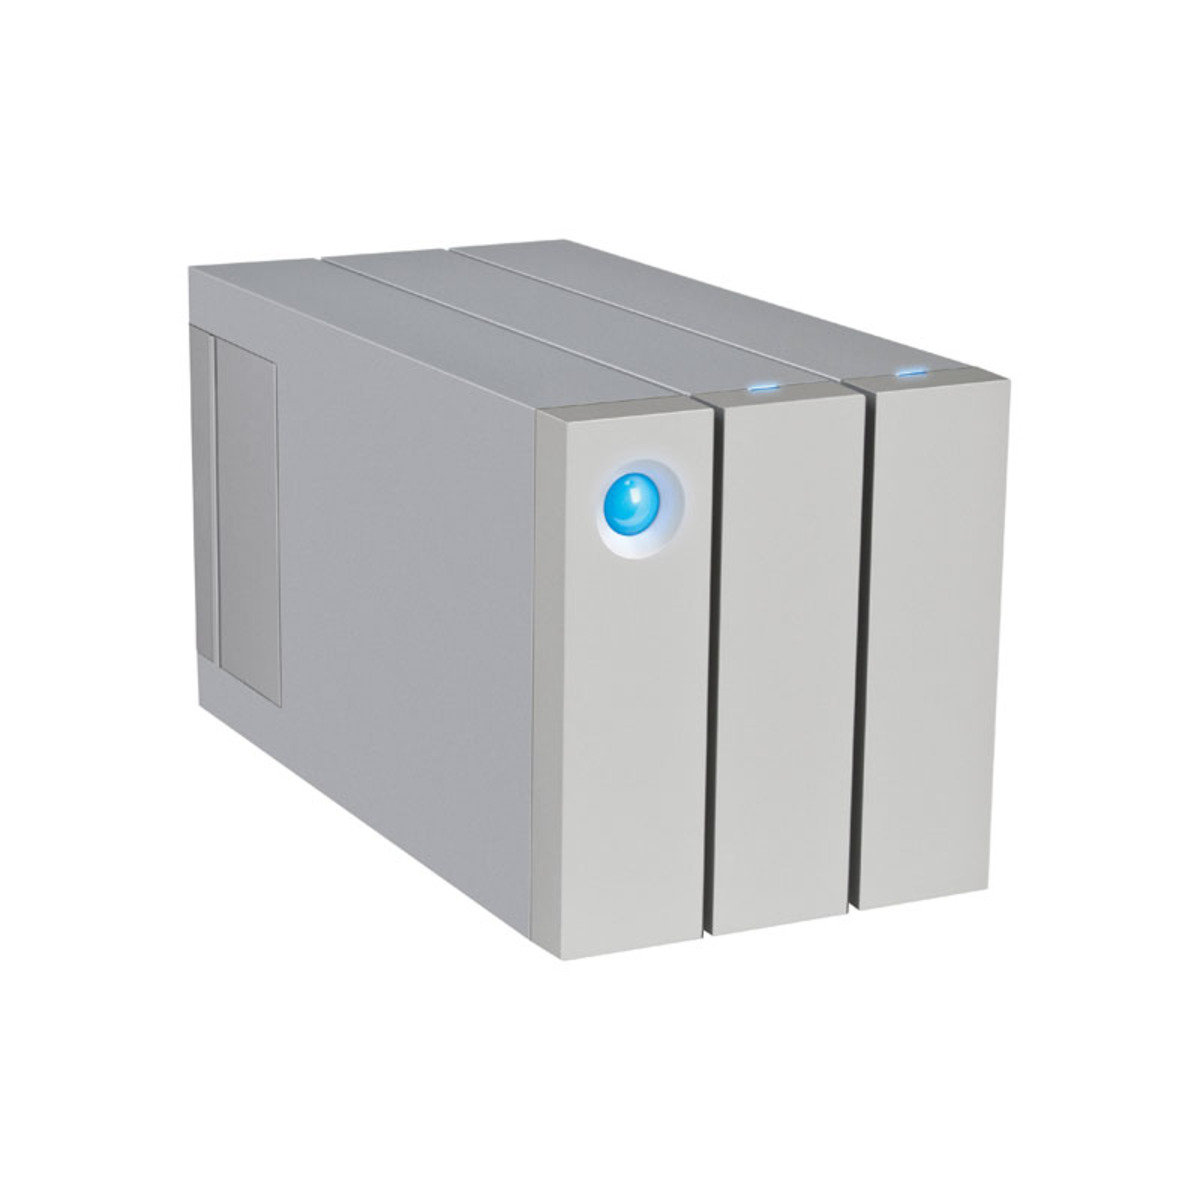 2big Thunderbolt 2 8TB 3.5吋 雙硬碟RAID外置硬碟 9000438U